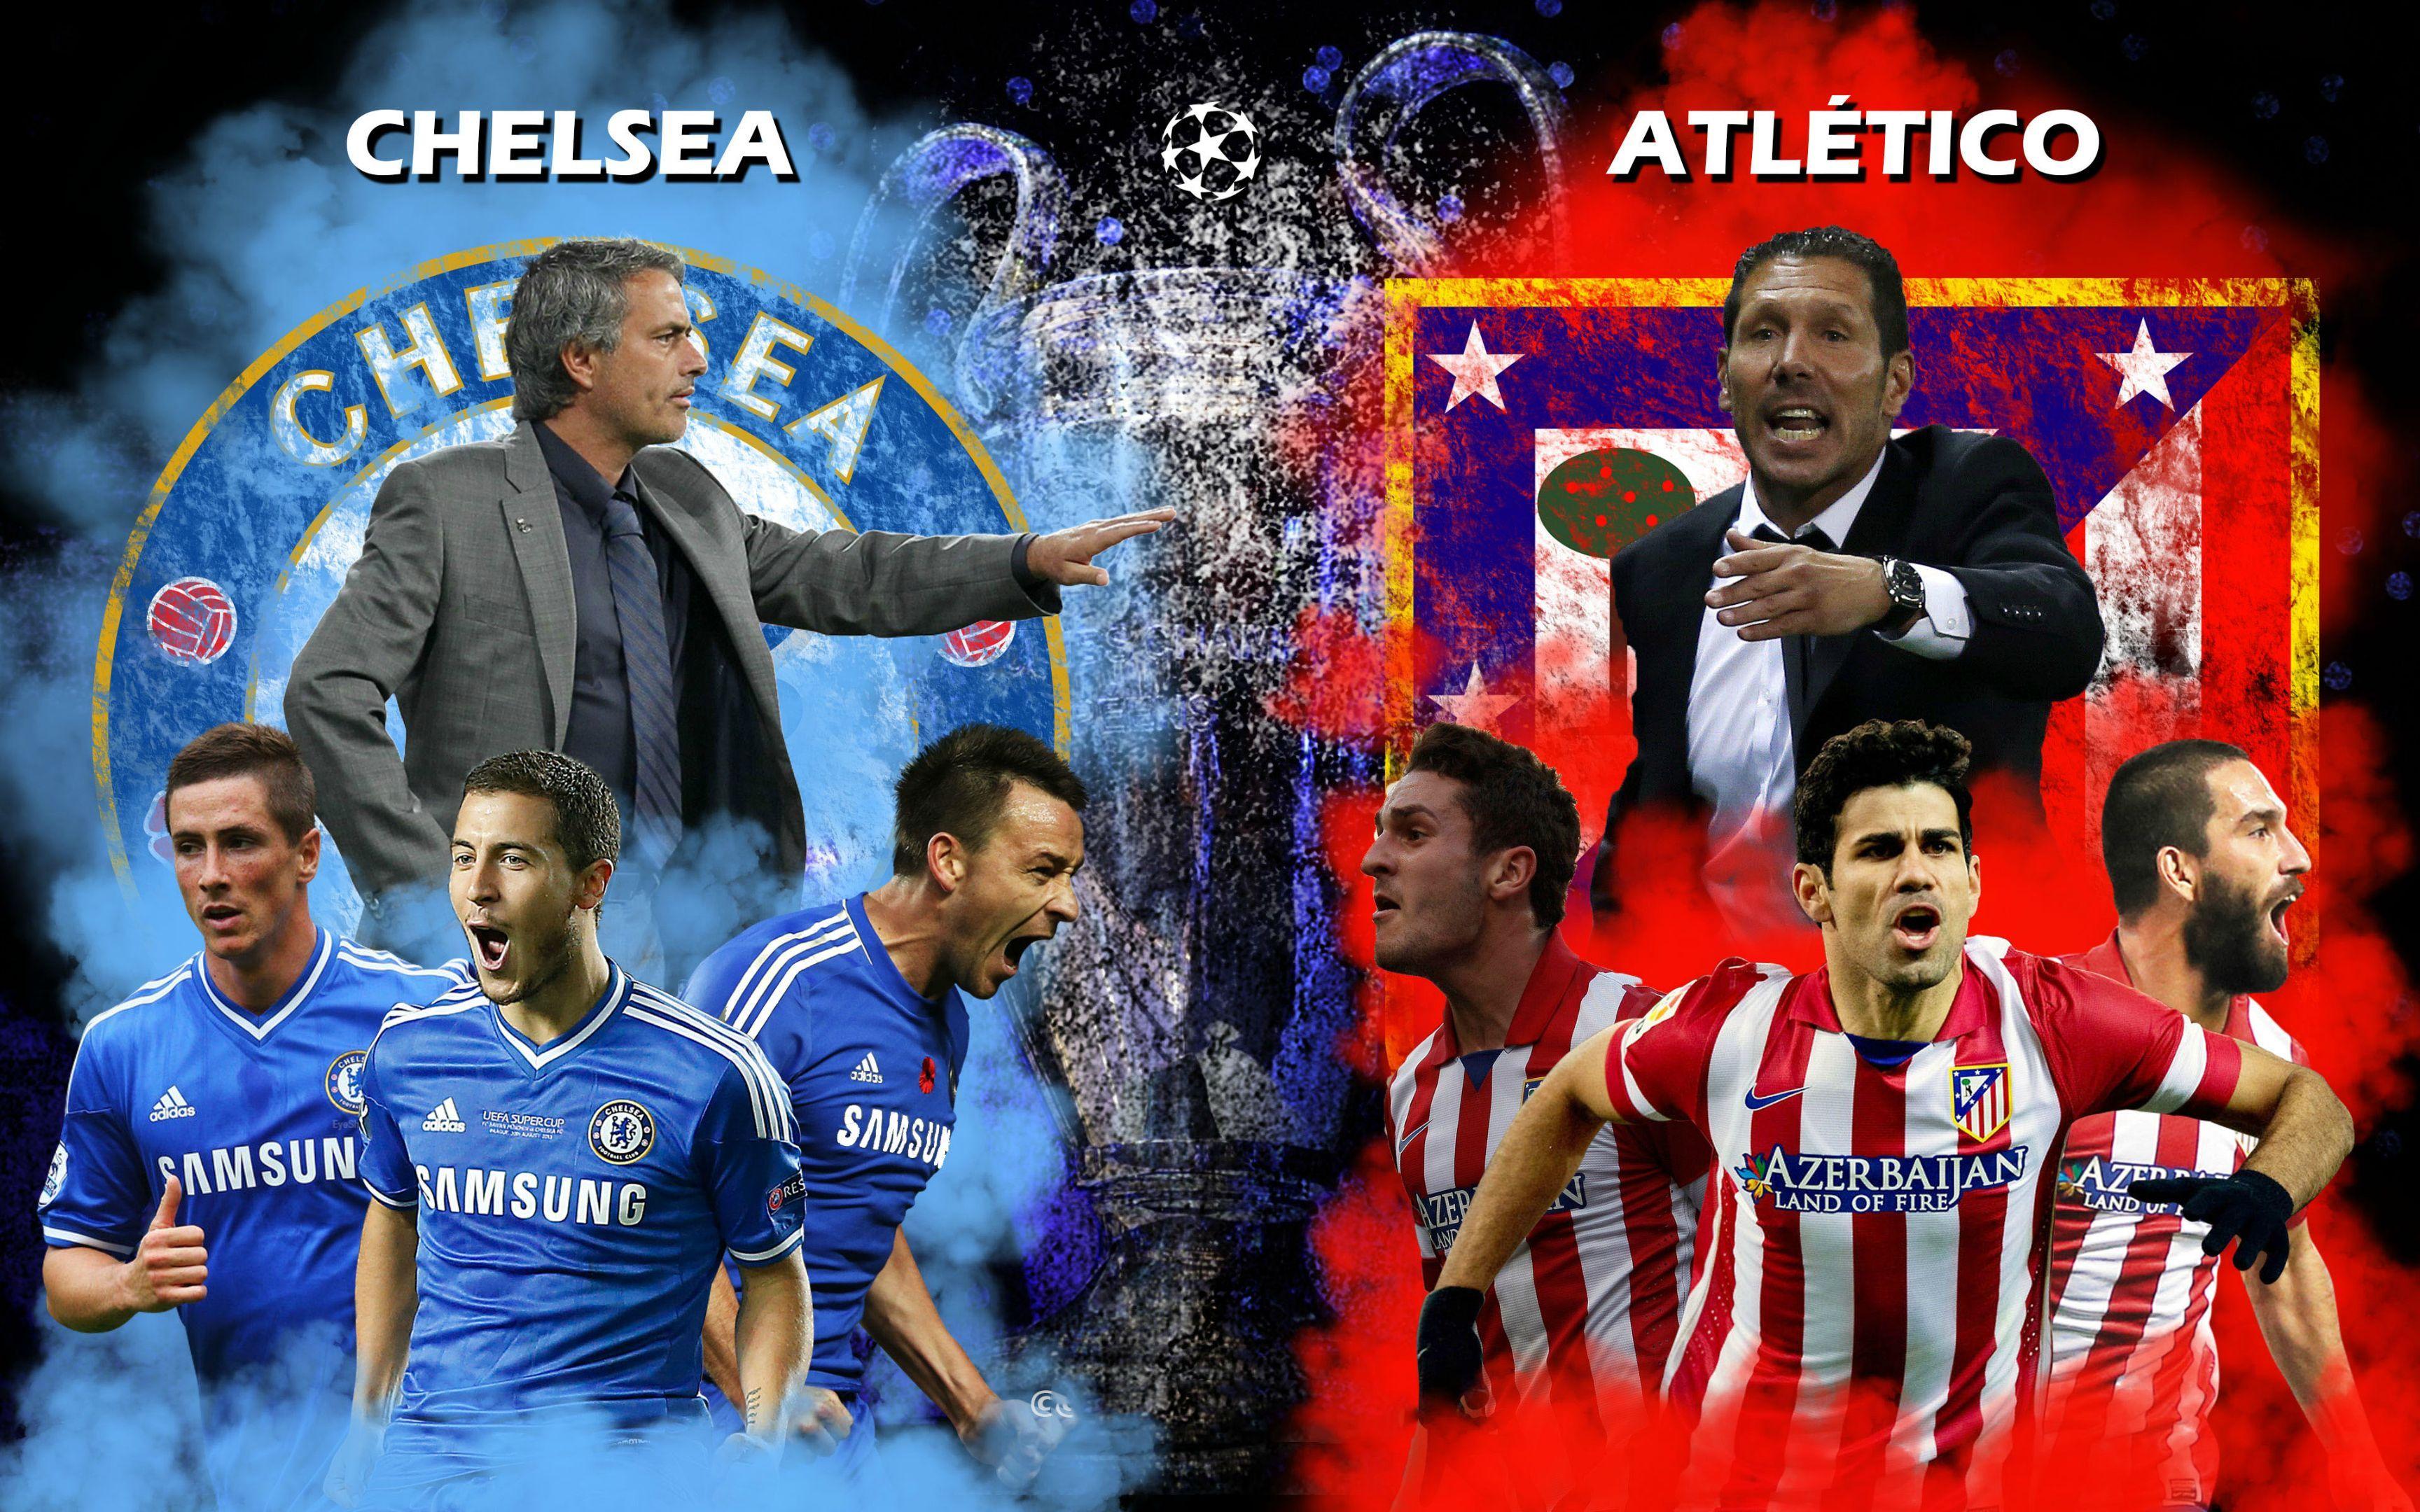 Chelsea Vs Atletico Madrid Live Uefa Champions League Watch Imgur Atlético Madrid Chelsea Madrid